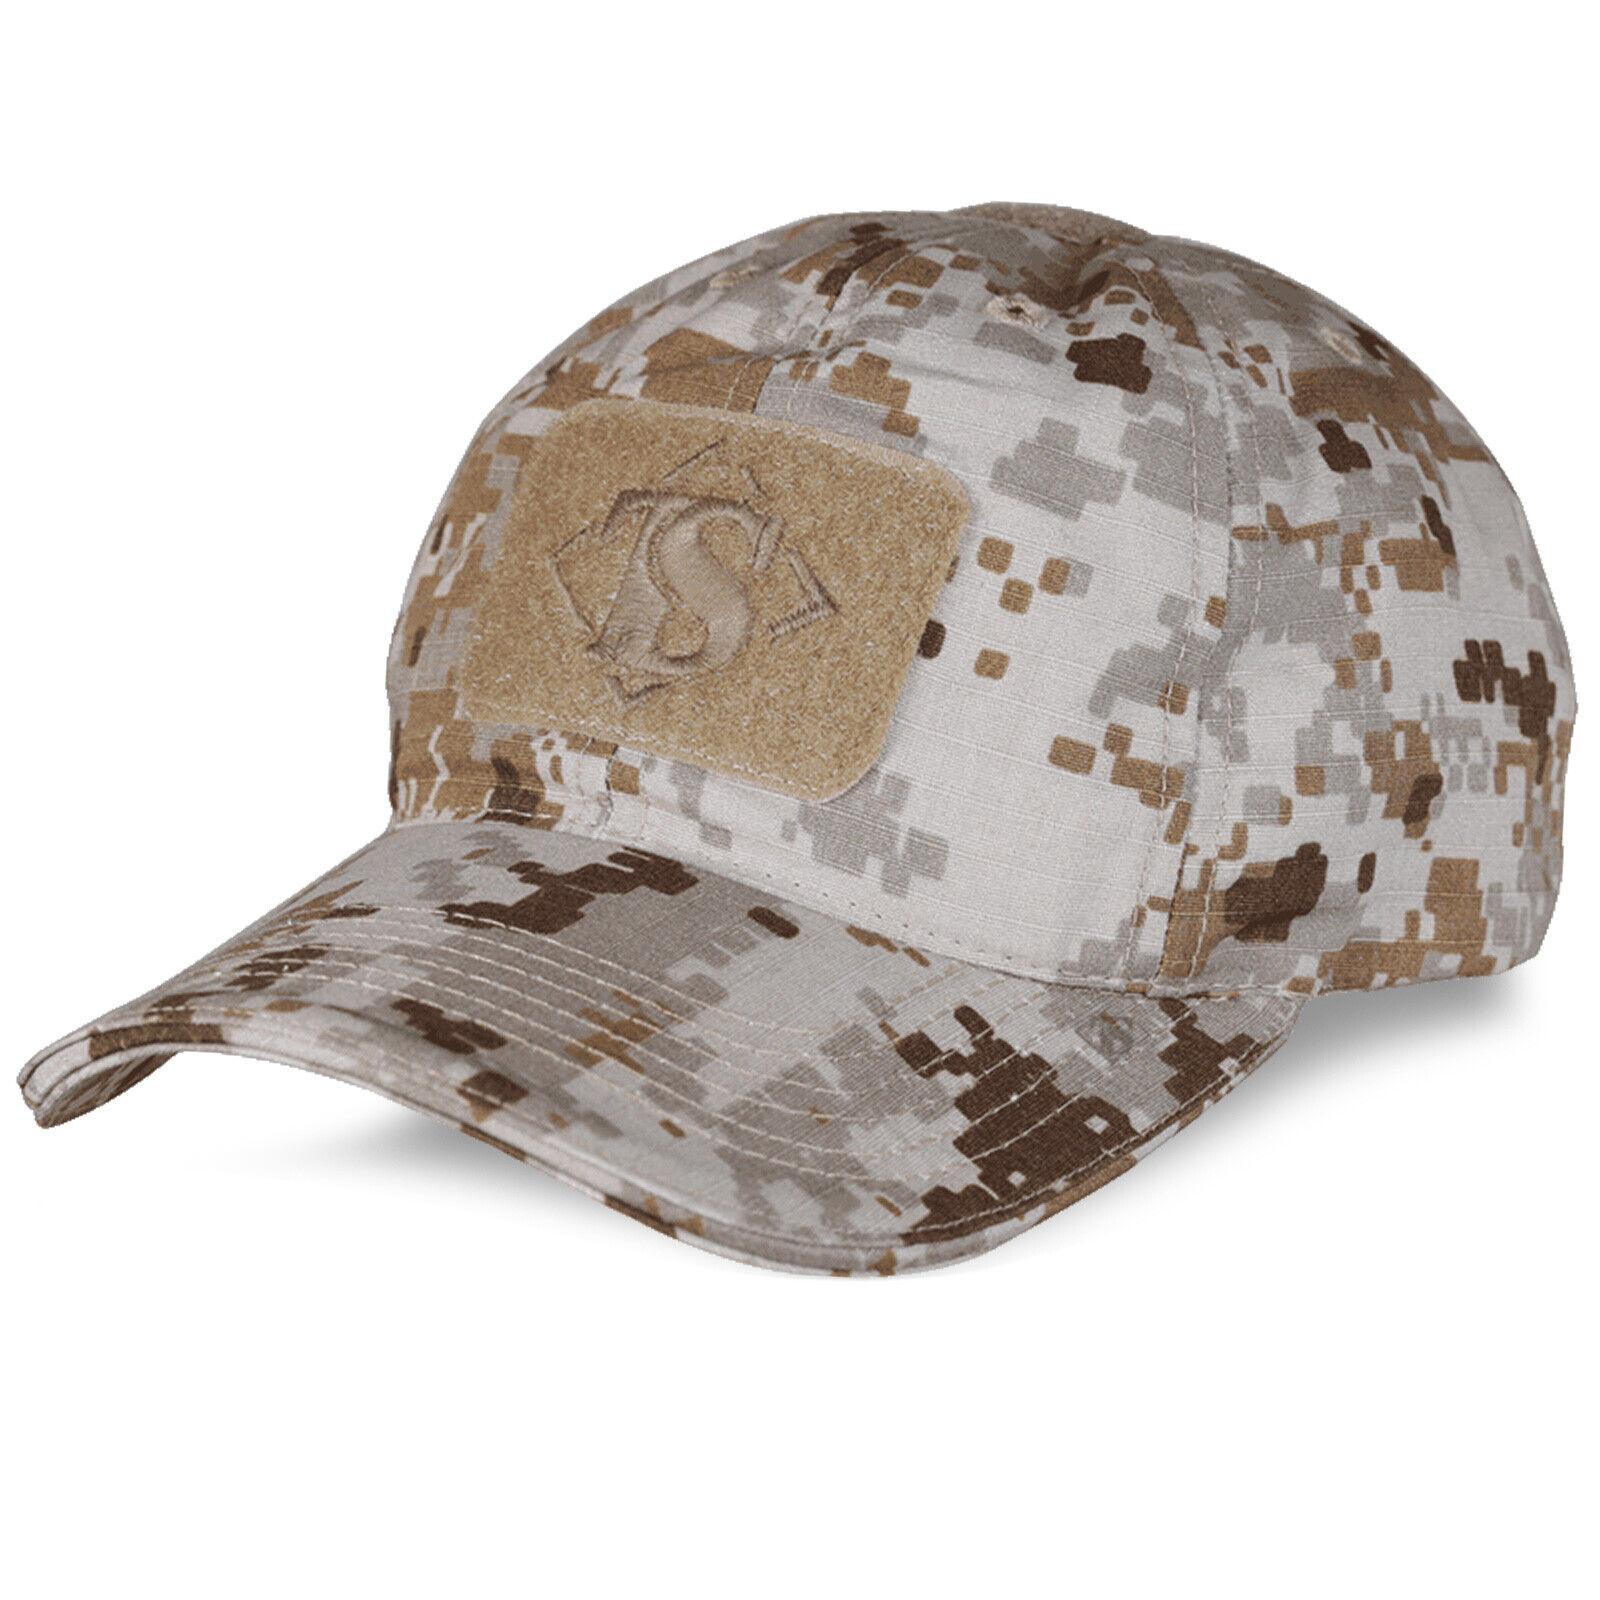 NEW MILITARY COOL CAMOUFLAGE ARMY BASEBALL CAP ARMY URBAN MULTICAM CAMO URBAN